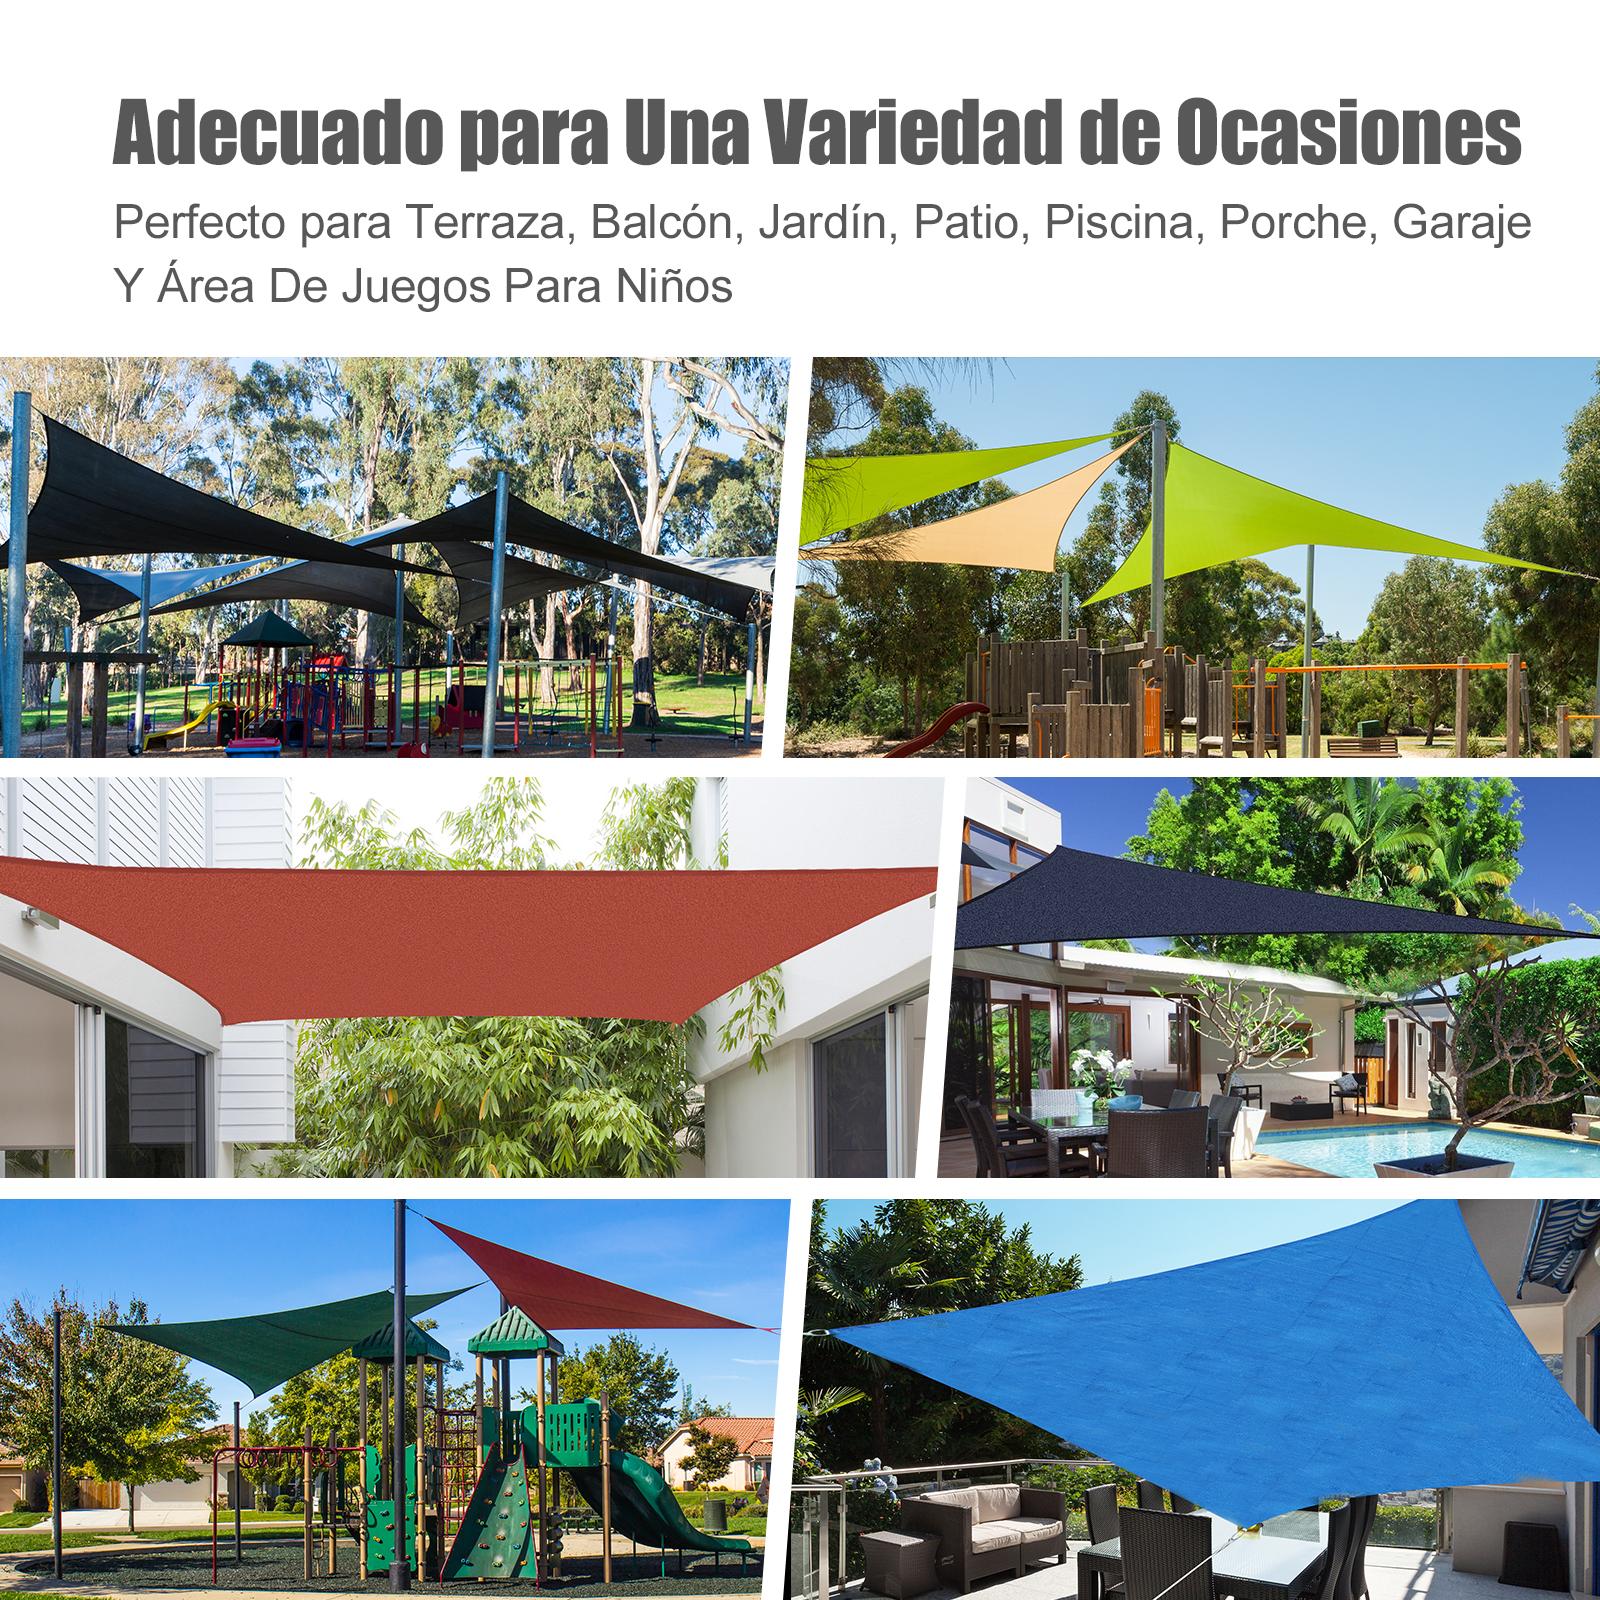 Toldo-Vela-Sombrilla-Parasol-Triangulo-Tejido-de-Poliester-185-g-m-Jardin-Playa miniatura 21